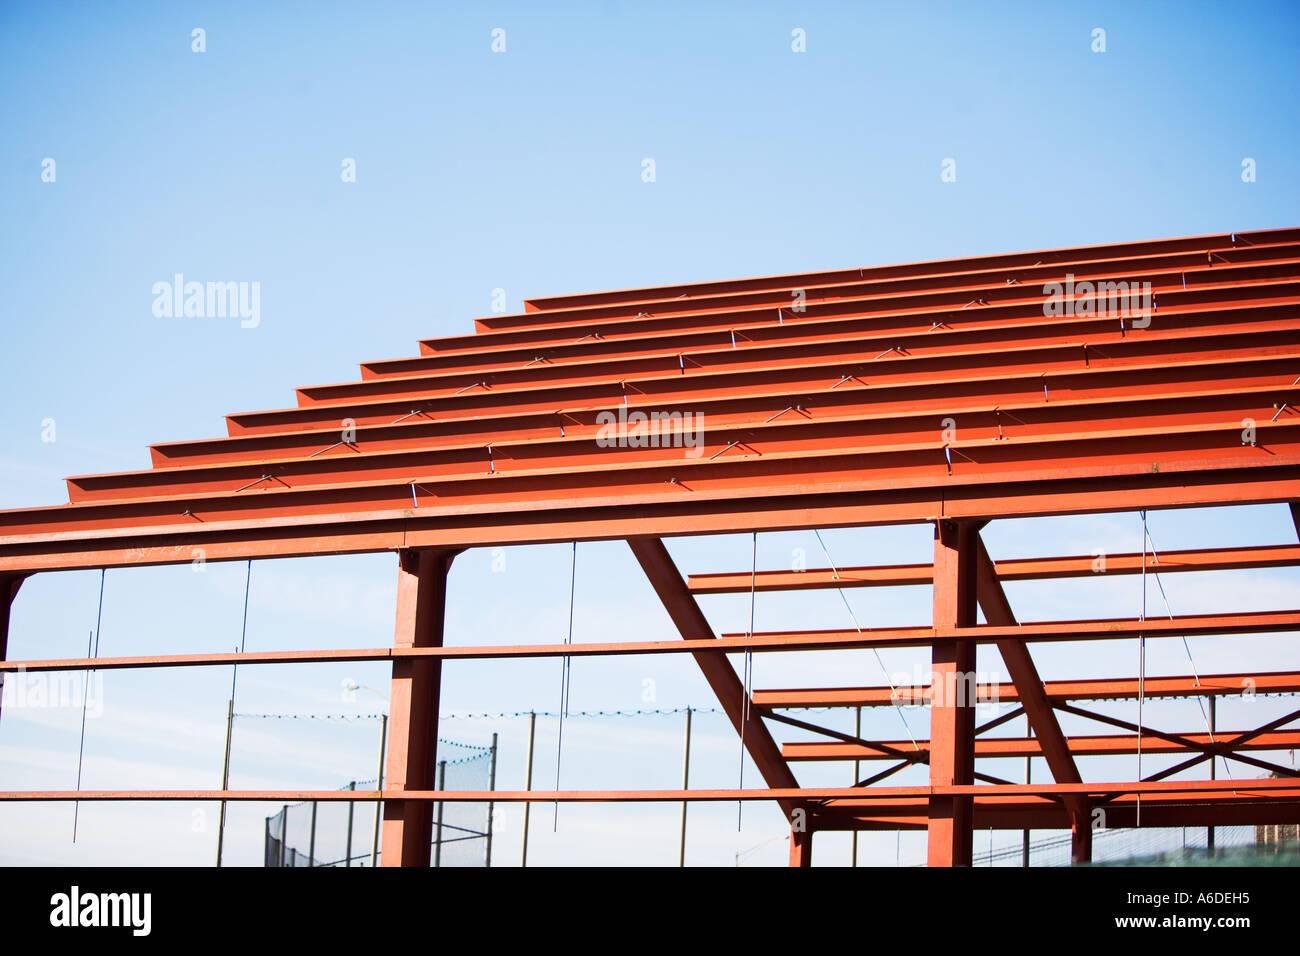 NEW BUILDING FRAMING, STEEL FRAMING, CONSTRUCTION Stock Photo ...